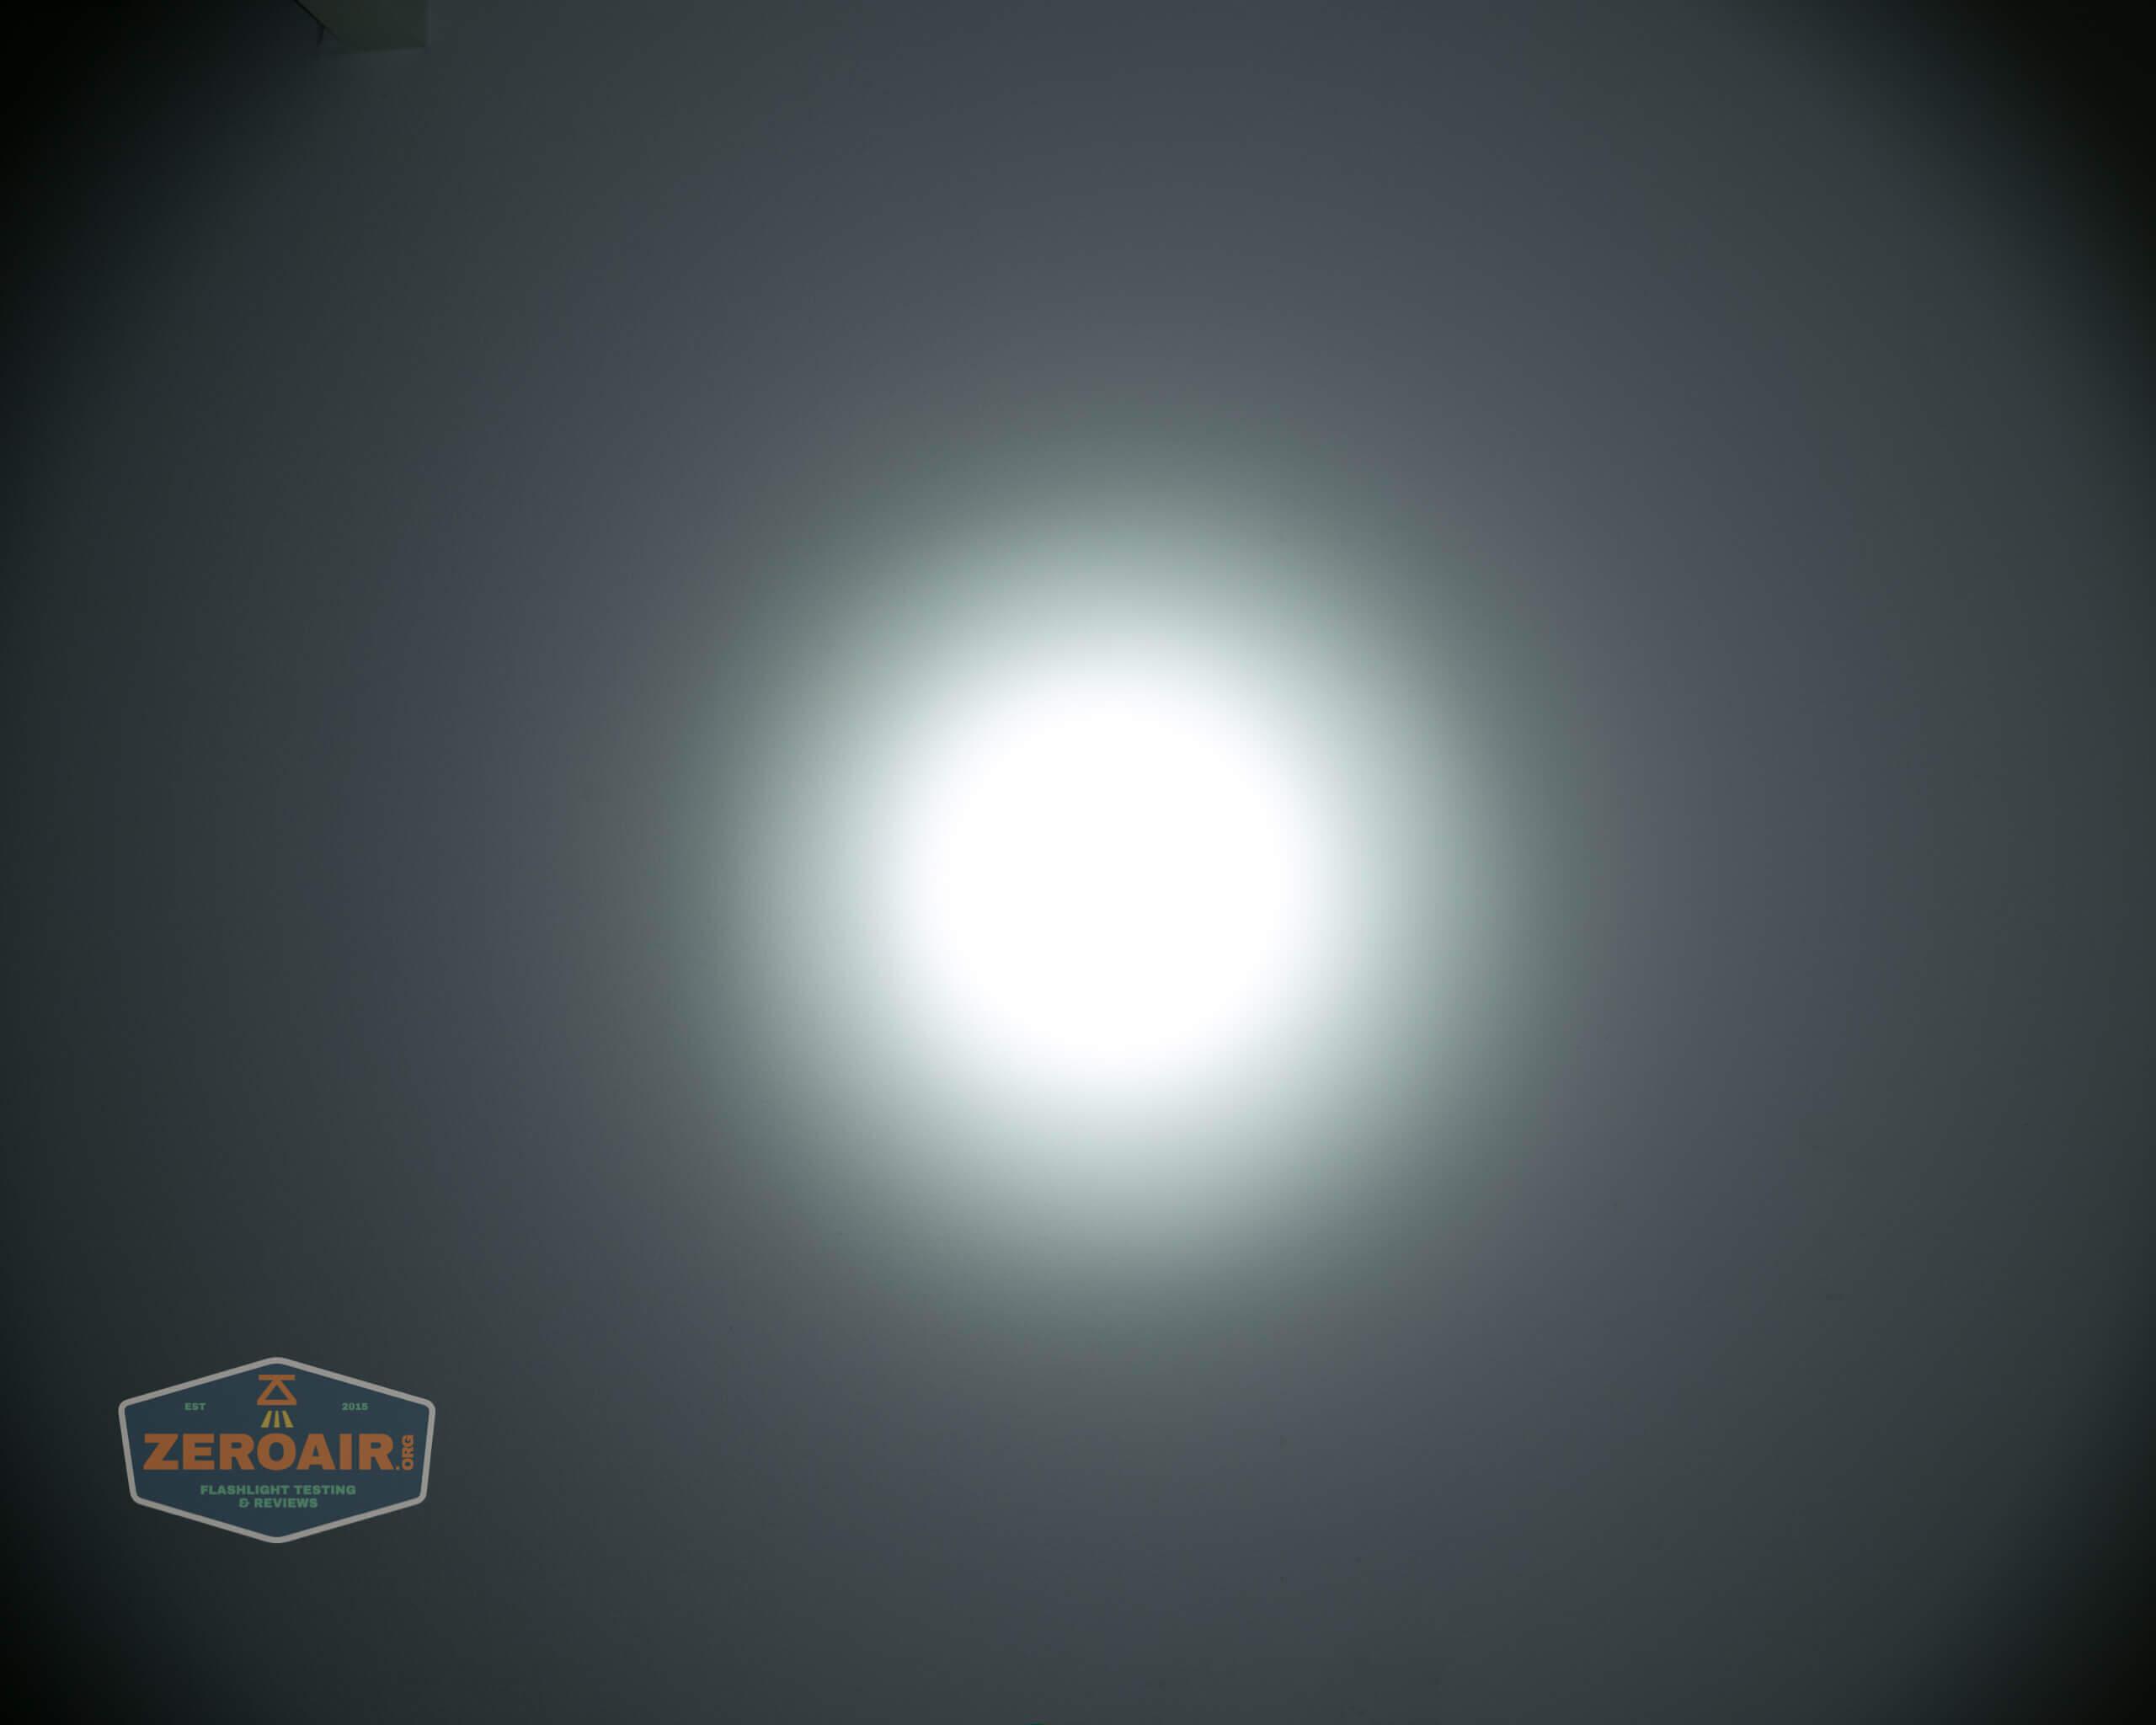 skilhunt m300 18650 flashlight beamshot ceiling 7